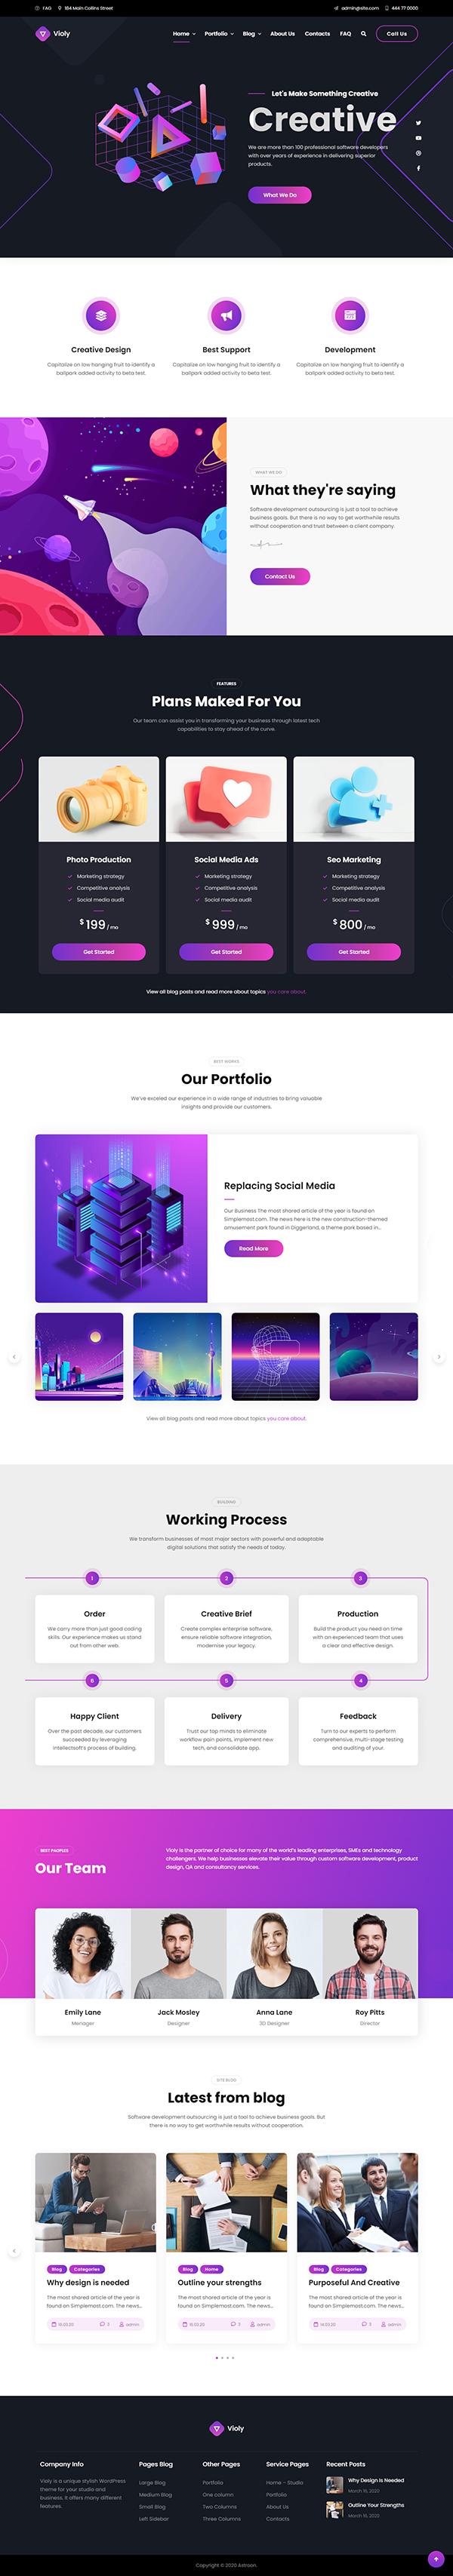 Violy - Creative Studio WordPress Theme